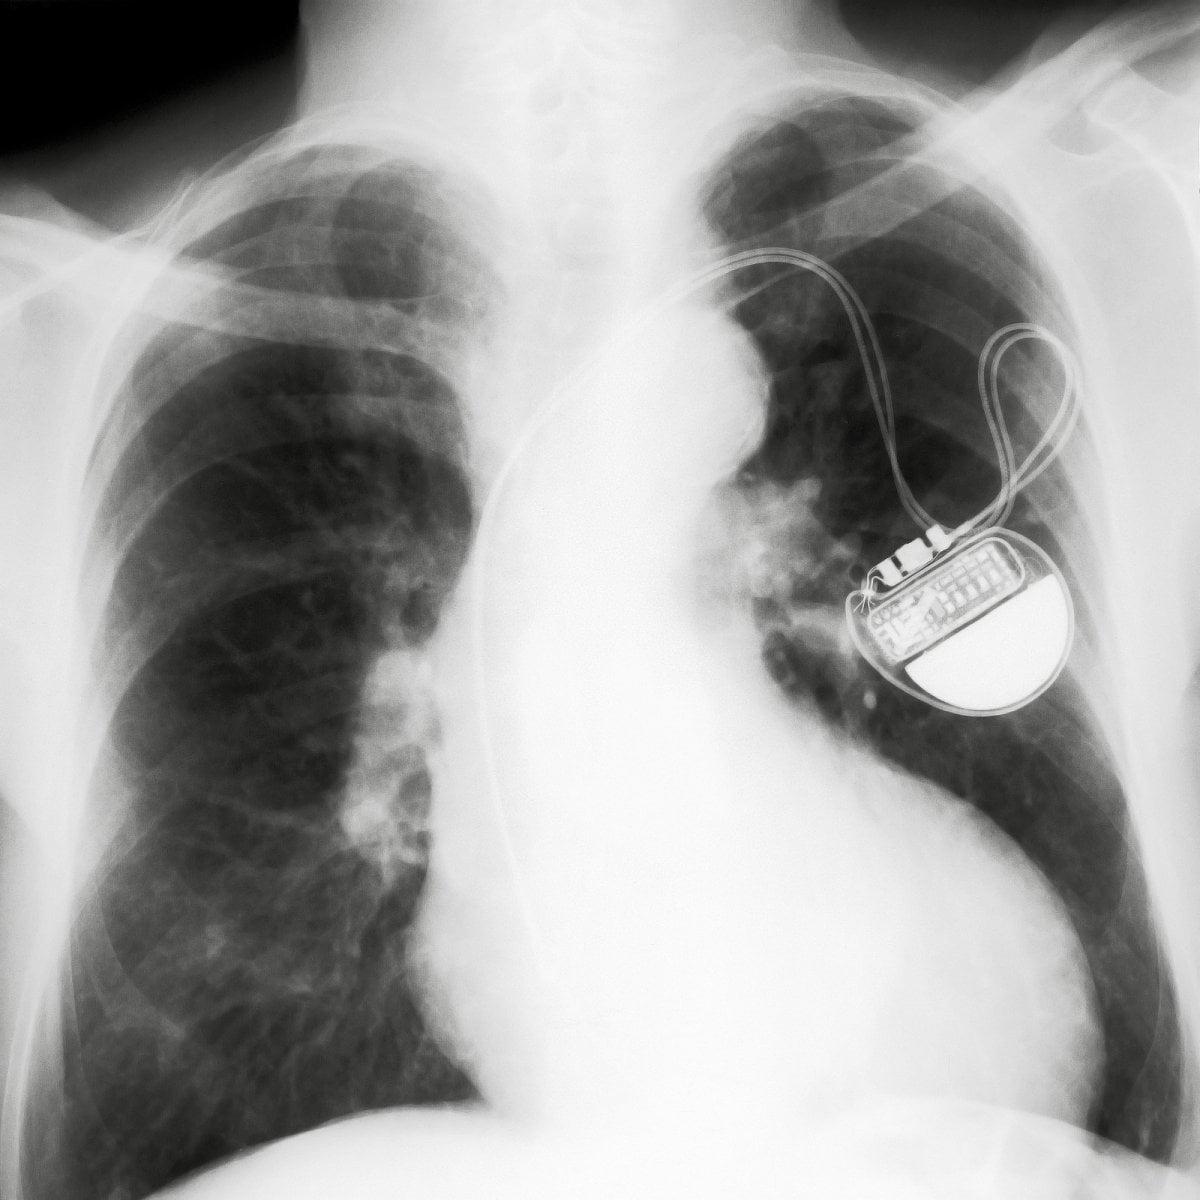 Kardiostimulátory